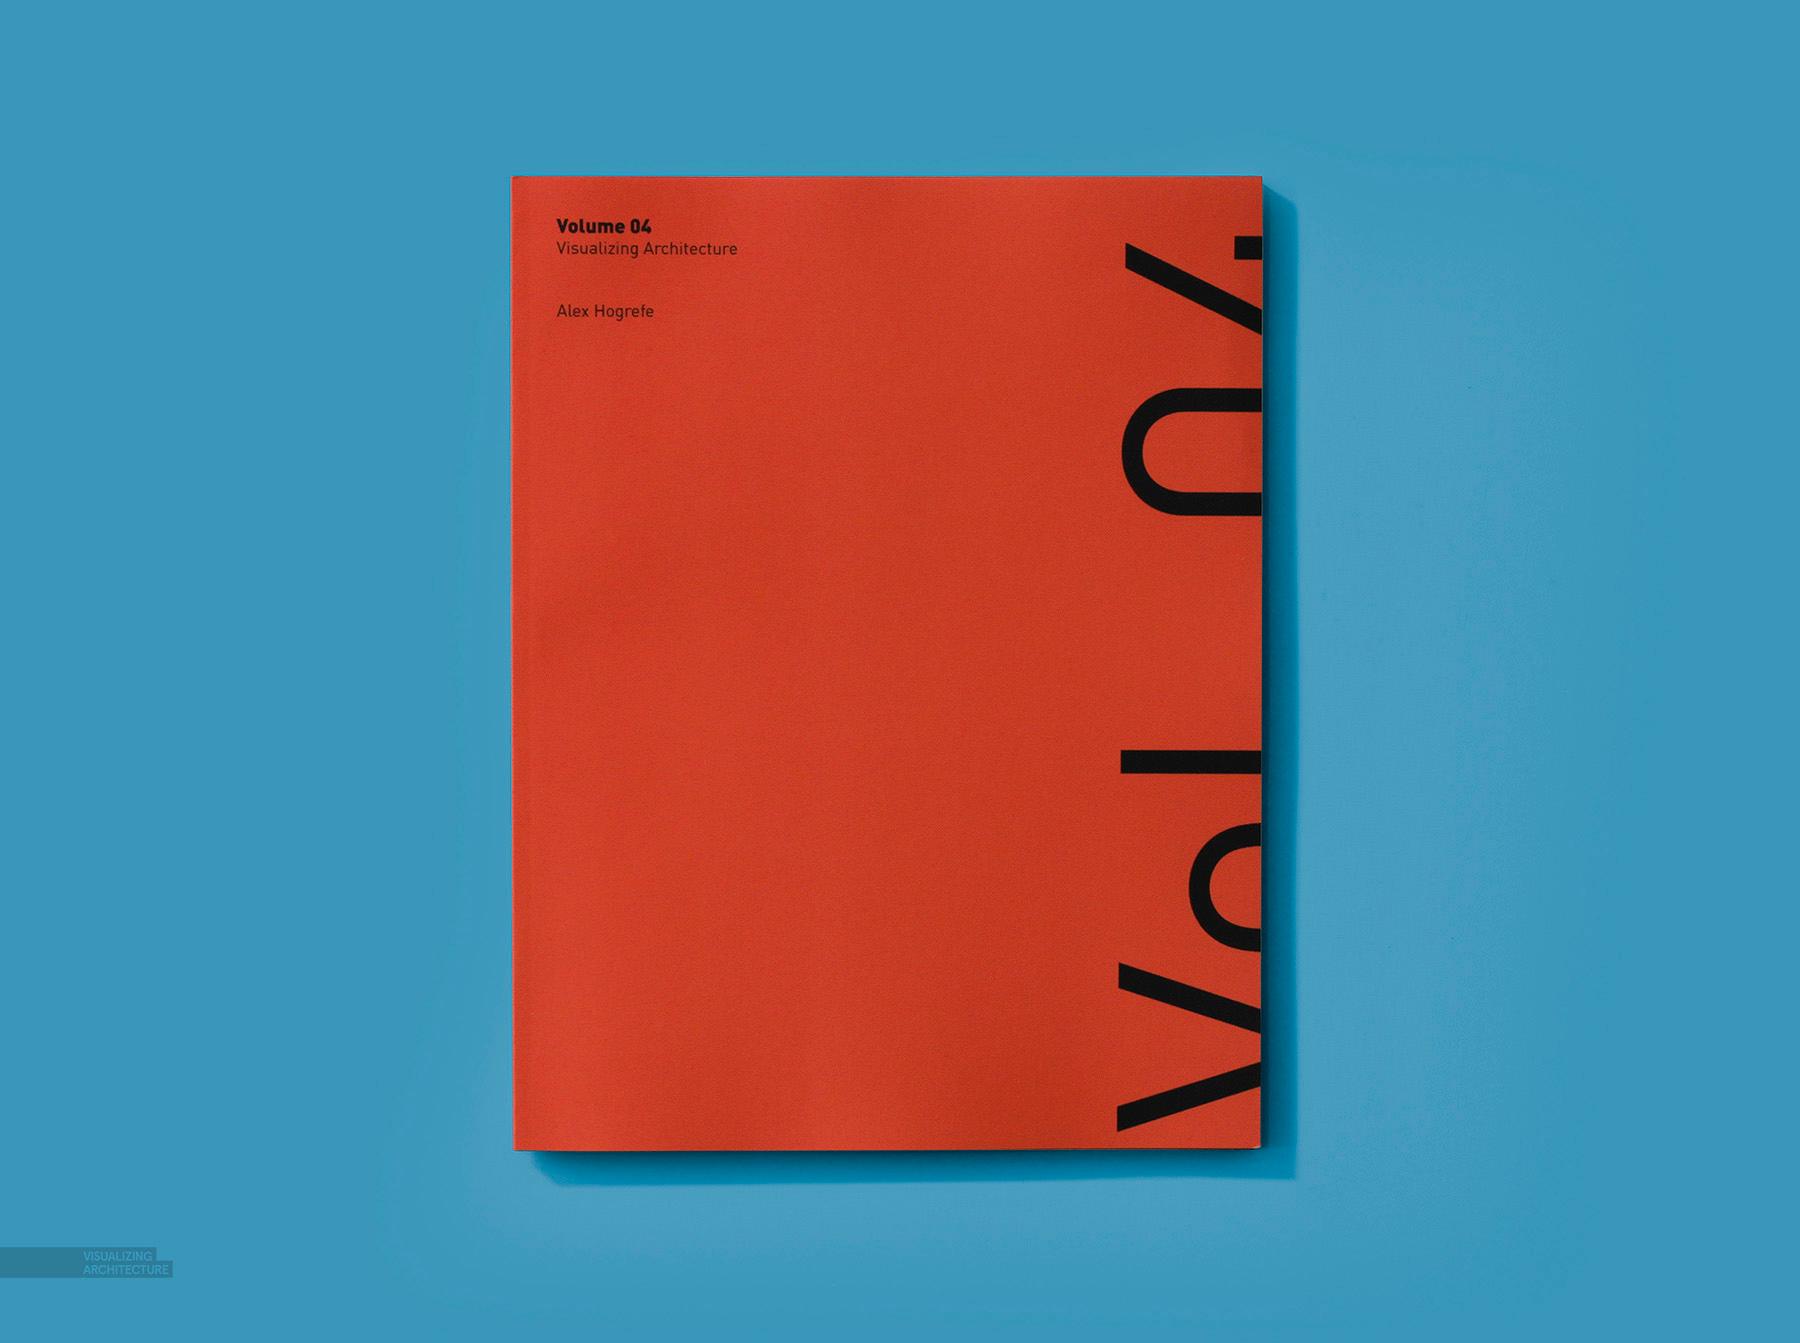 Portfolio Volume 05: Covers | Visualizing Architecture -  Portfolio Volume 05: Covers | Visualizing Architecture  - #abstractmodelarchitecture #architecturallandscape #architecturalportfoliocoverpage #architecture #covers #portfolio #visualizing #volume